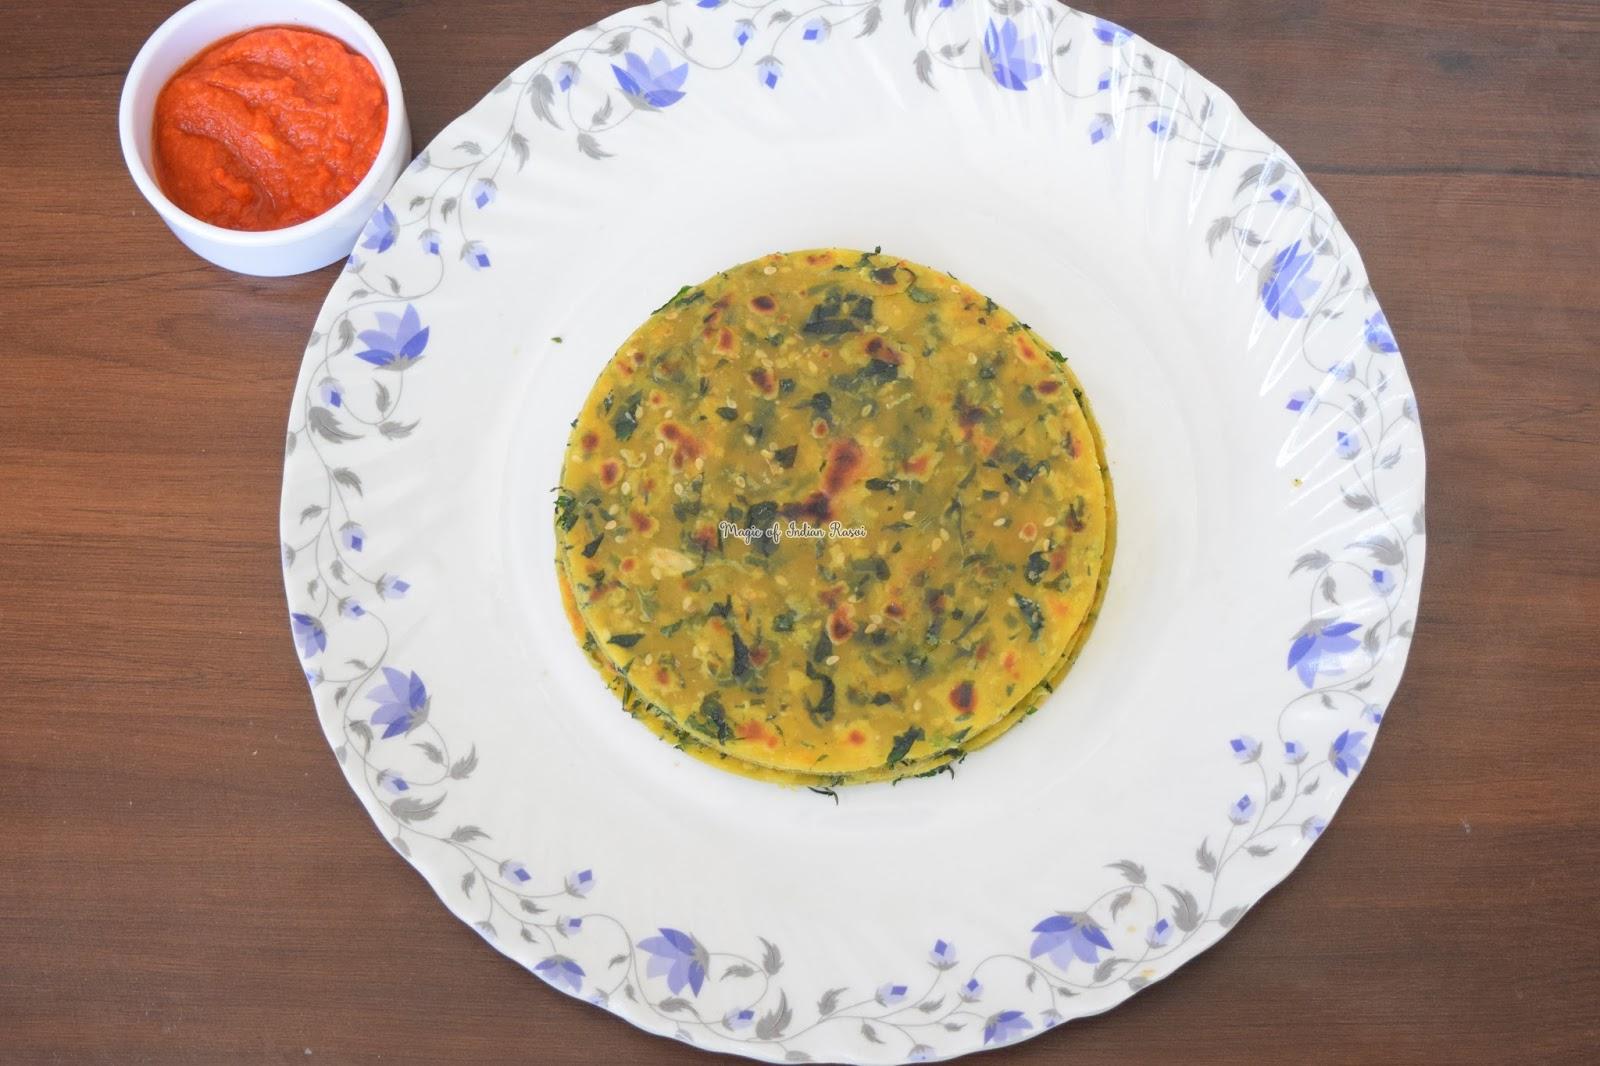 Gujarati Methi Thepla Recipe - गुजराती मेथी थेपला रेसिपी - Priya R - Magic of Indian Rasoi